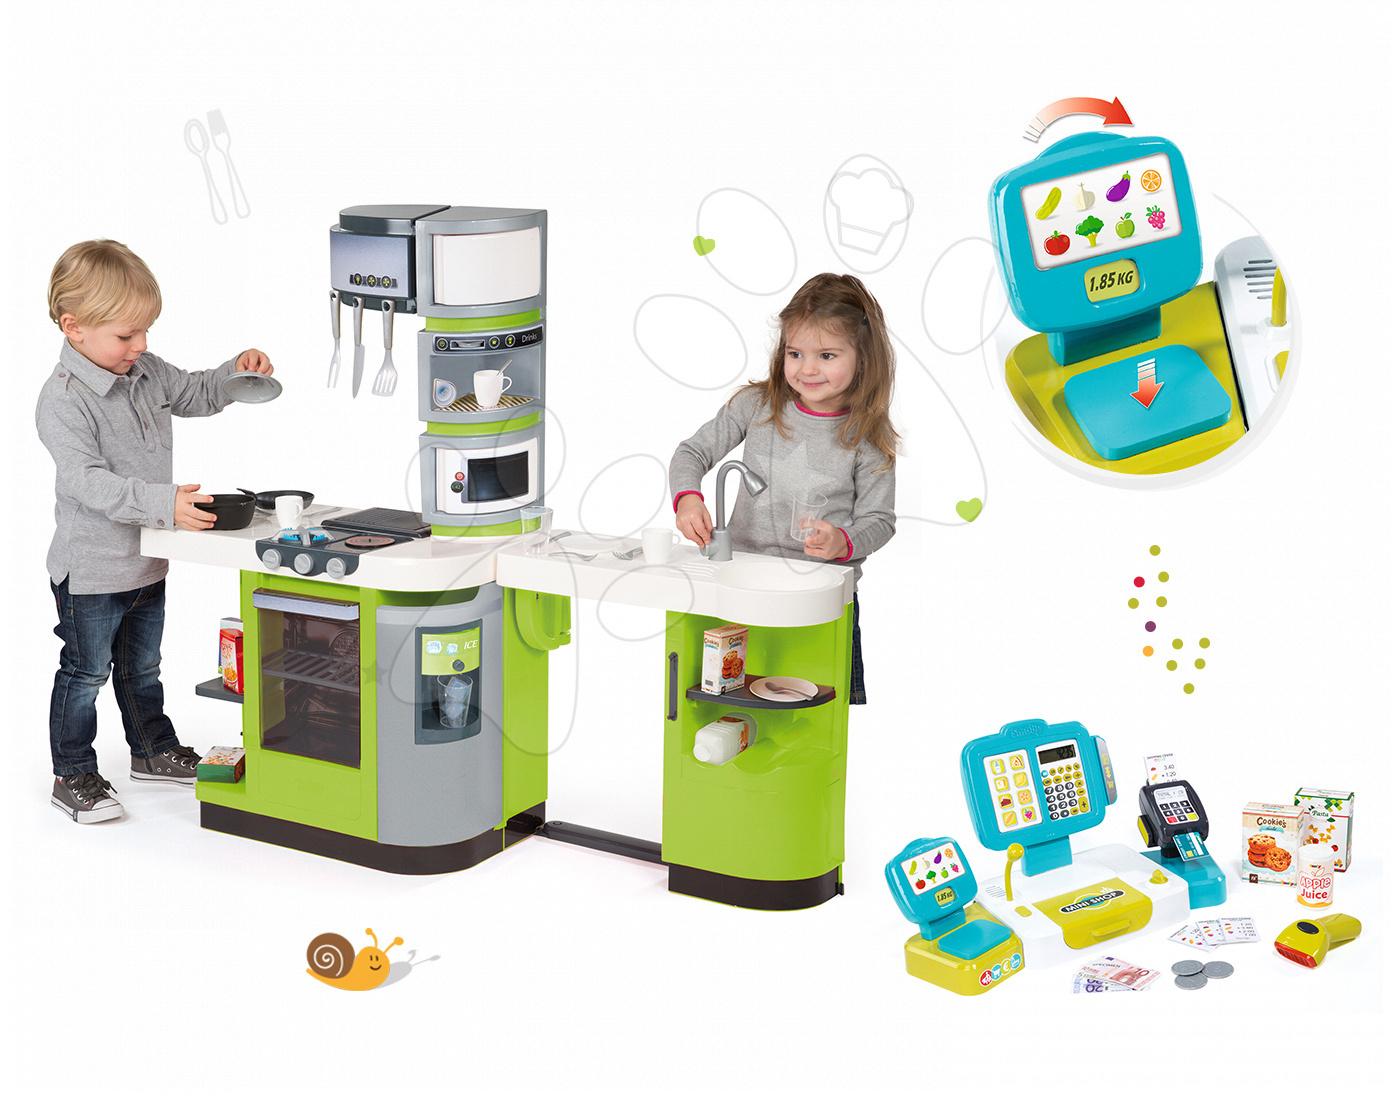 Set kuchyňka CookMaster Verte Smoby s ledem a elektronická pokladna Mini Shop